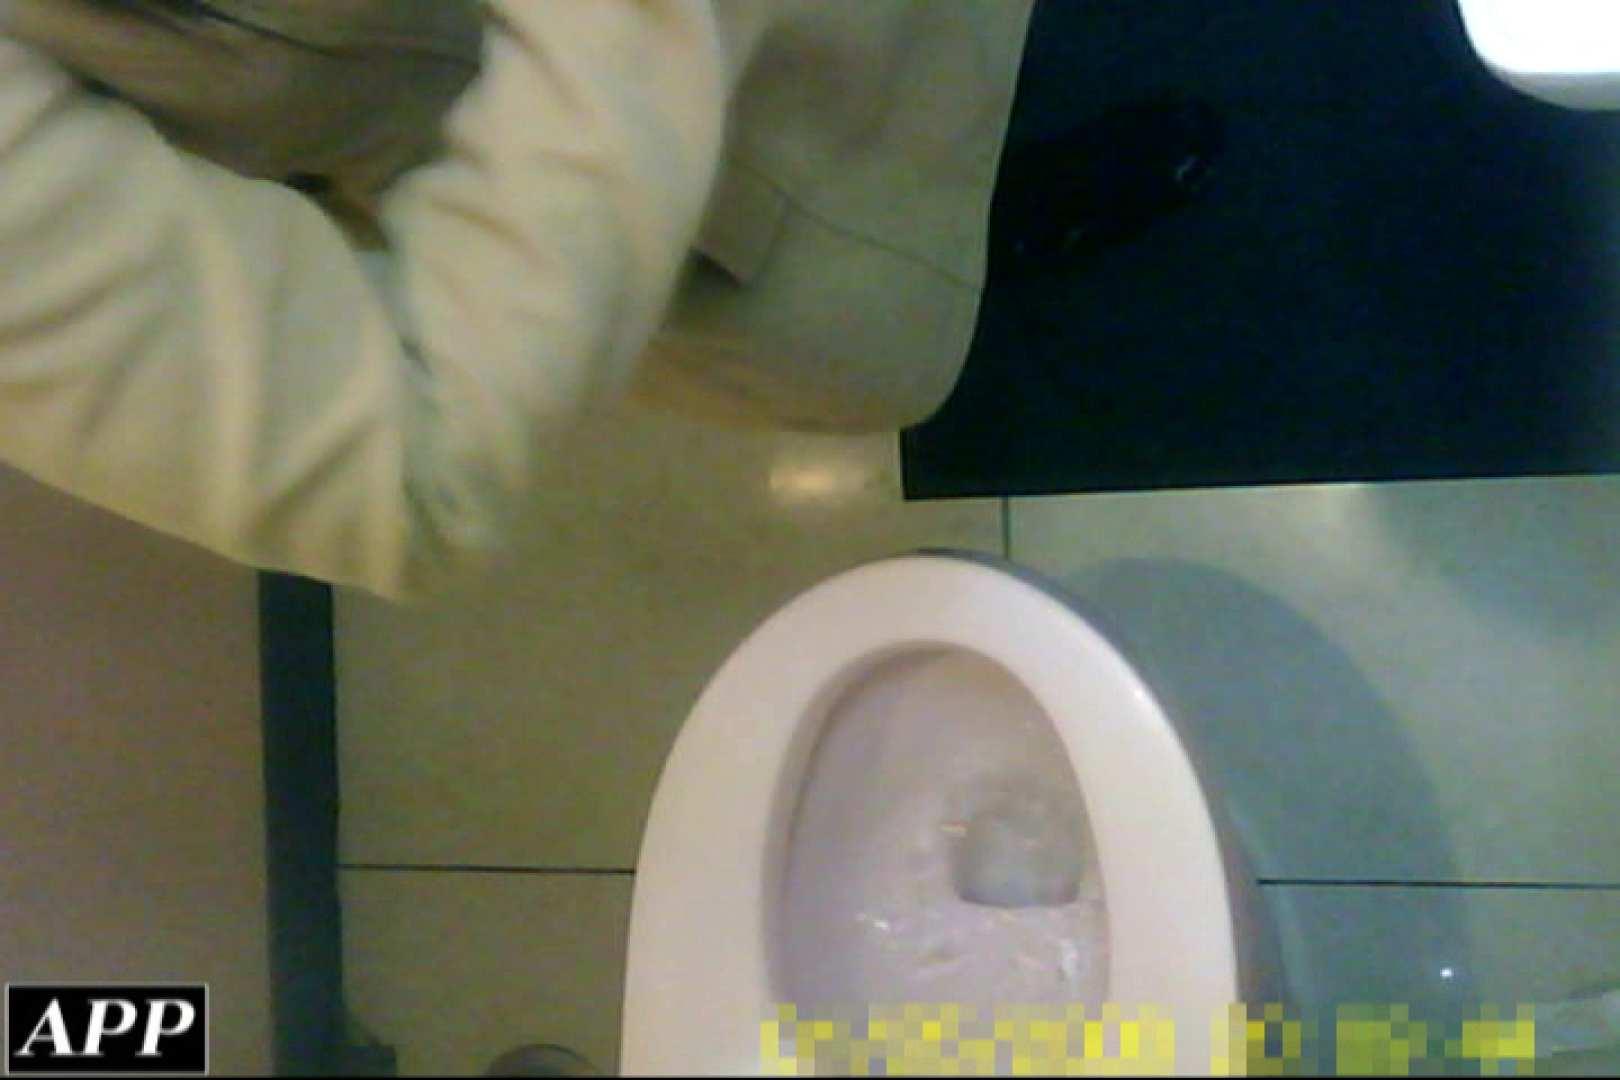 3視点洗面所 vol.79 OLハメ撮り  89Pix 21